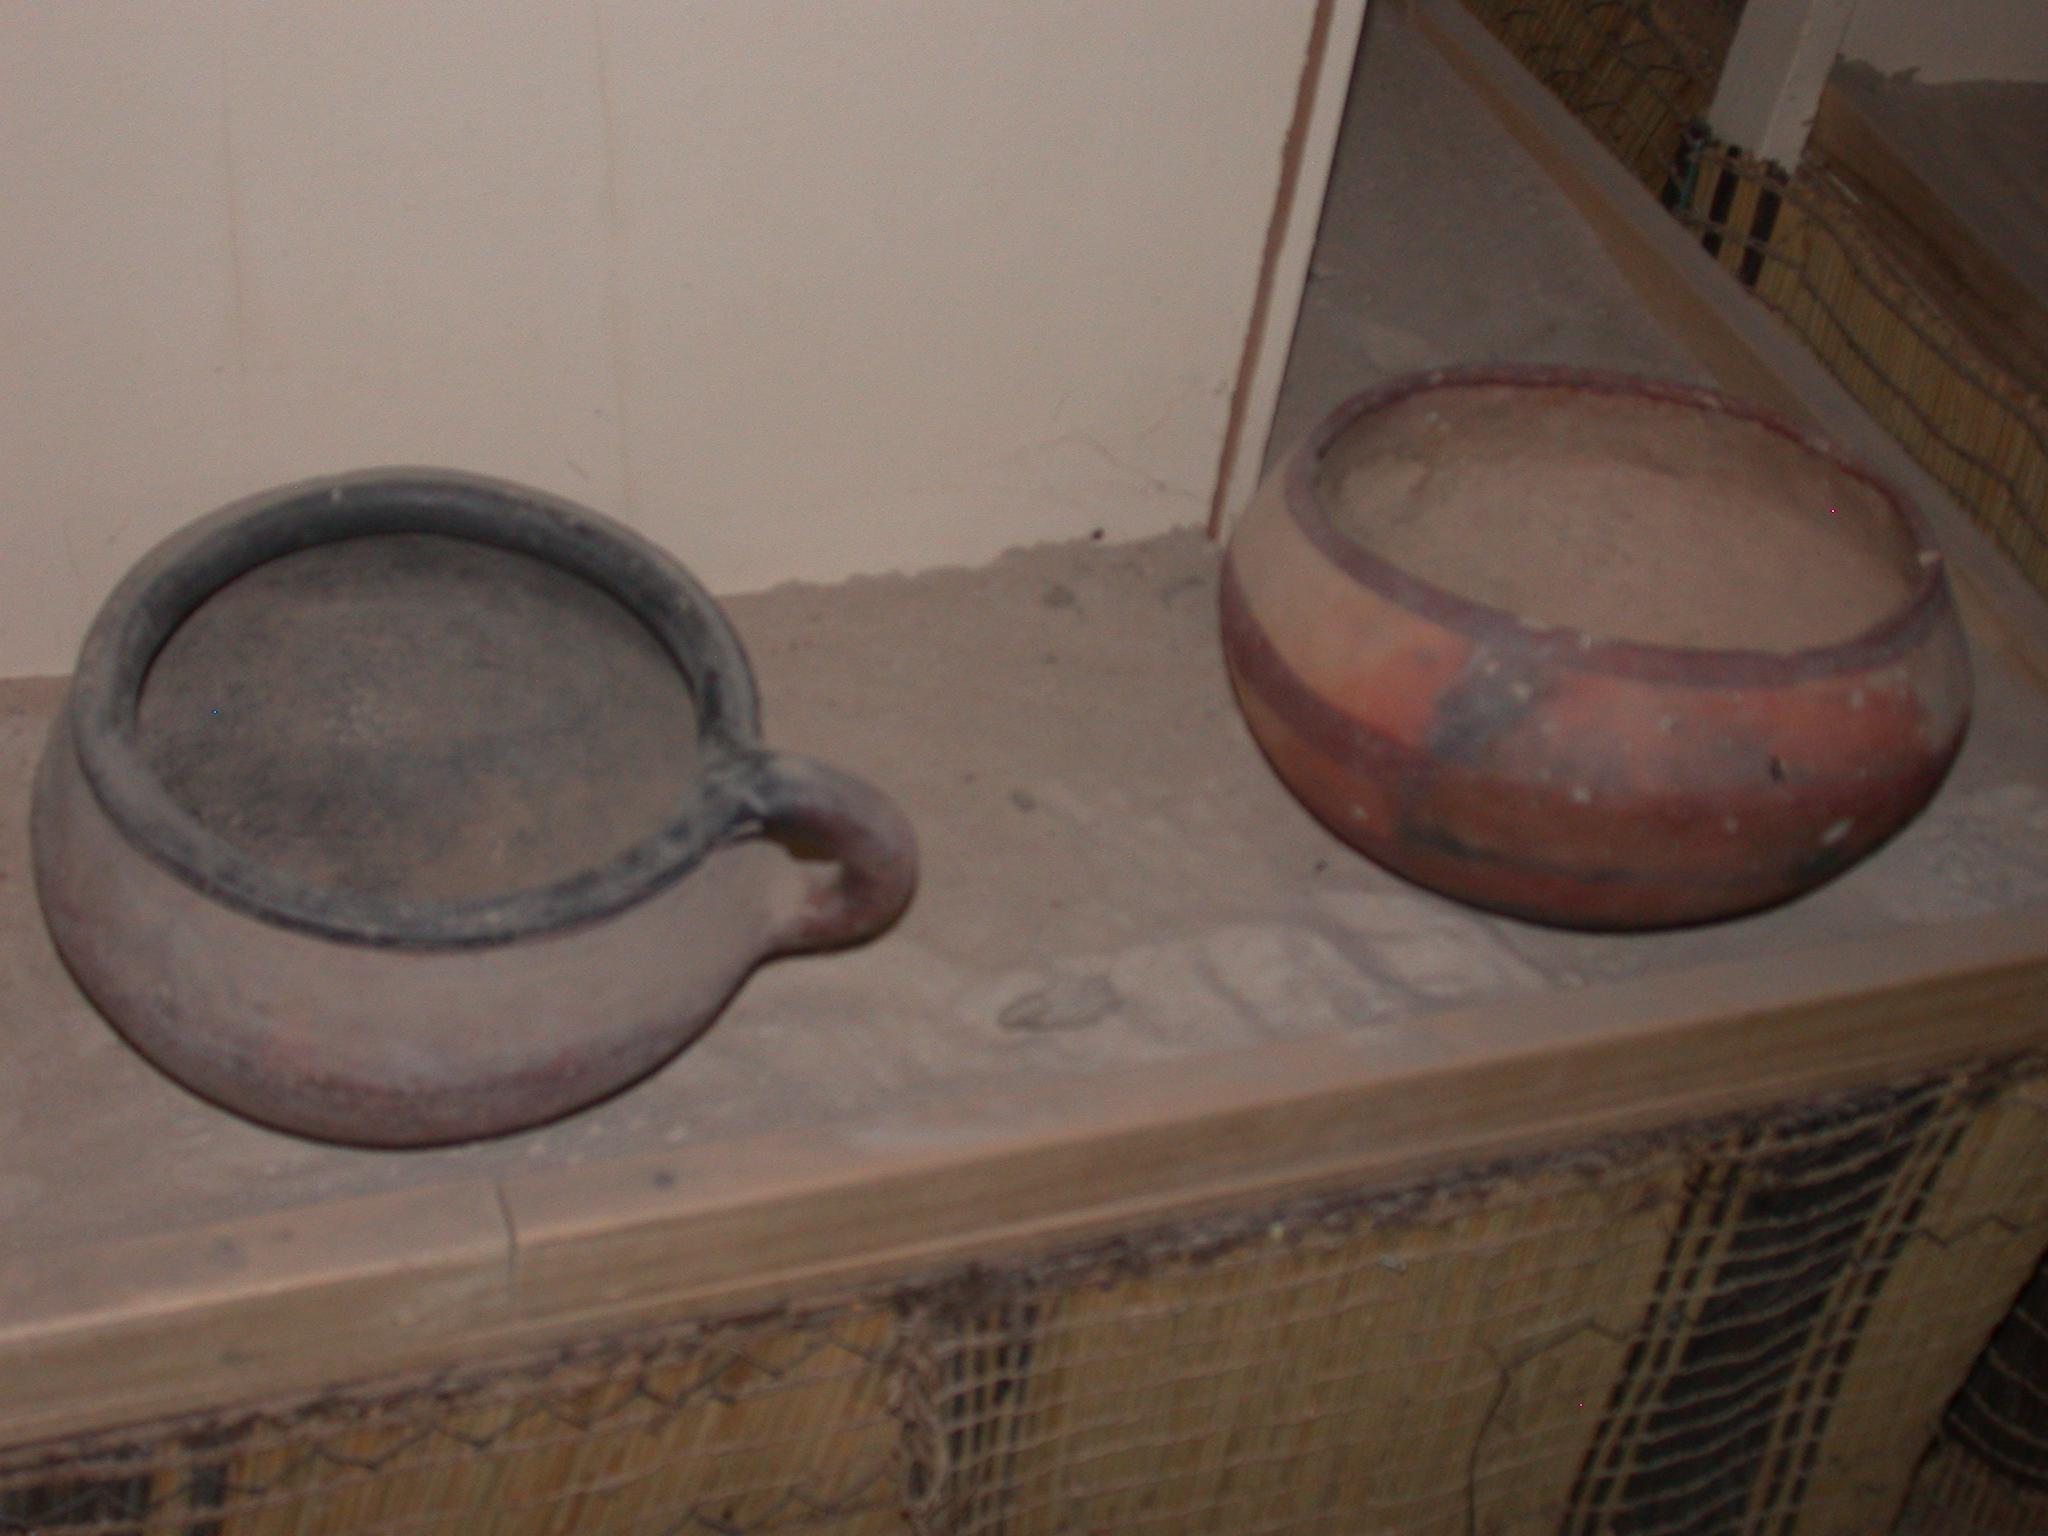 Bowls, Timbuktu Ethnological Museum, Timbuktu, Mali